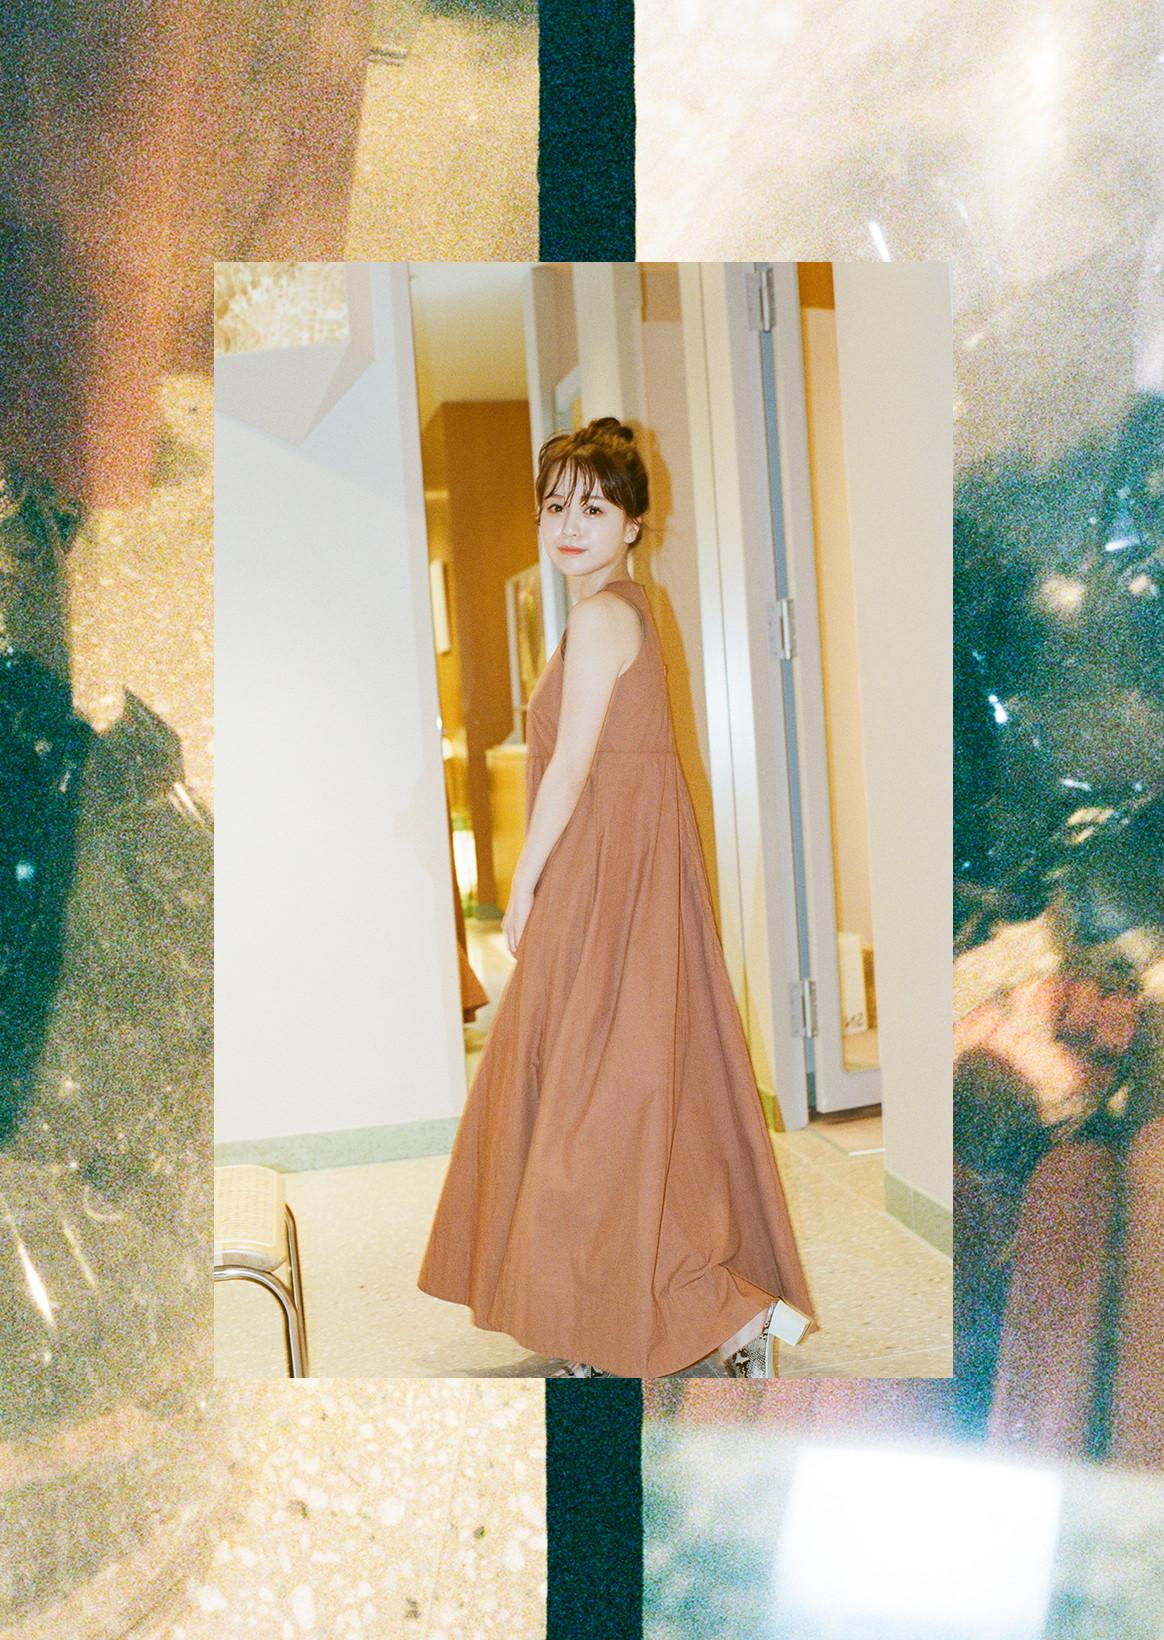 yuukosu×SNIDEL/FURFUR|作为贴近现代女性的sasutinaburu的空间和时装